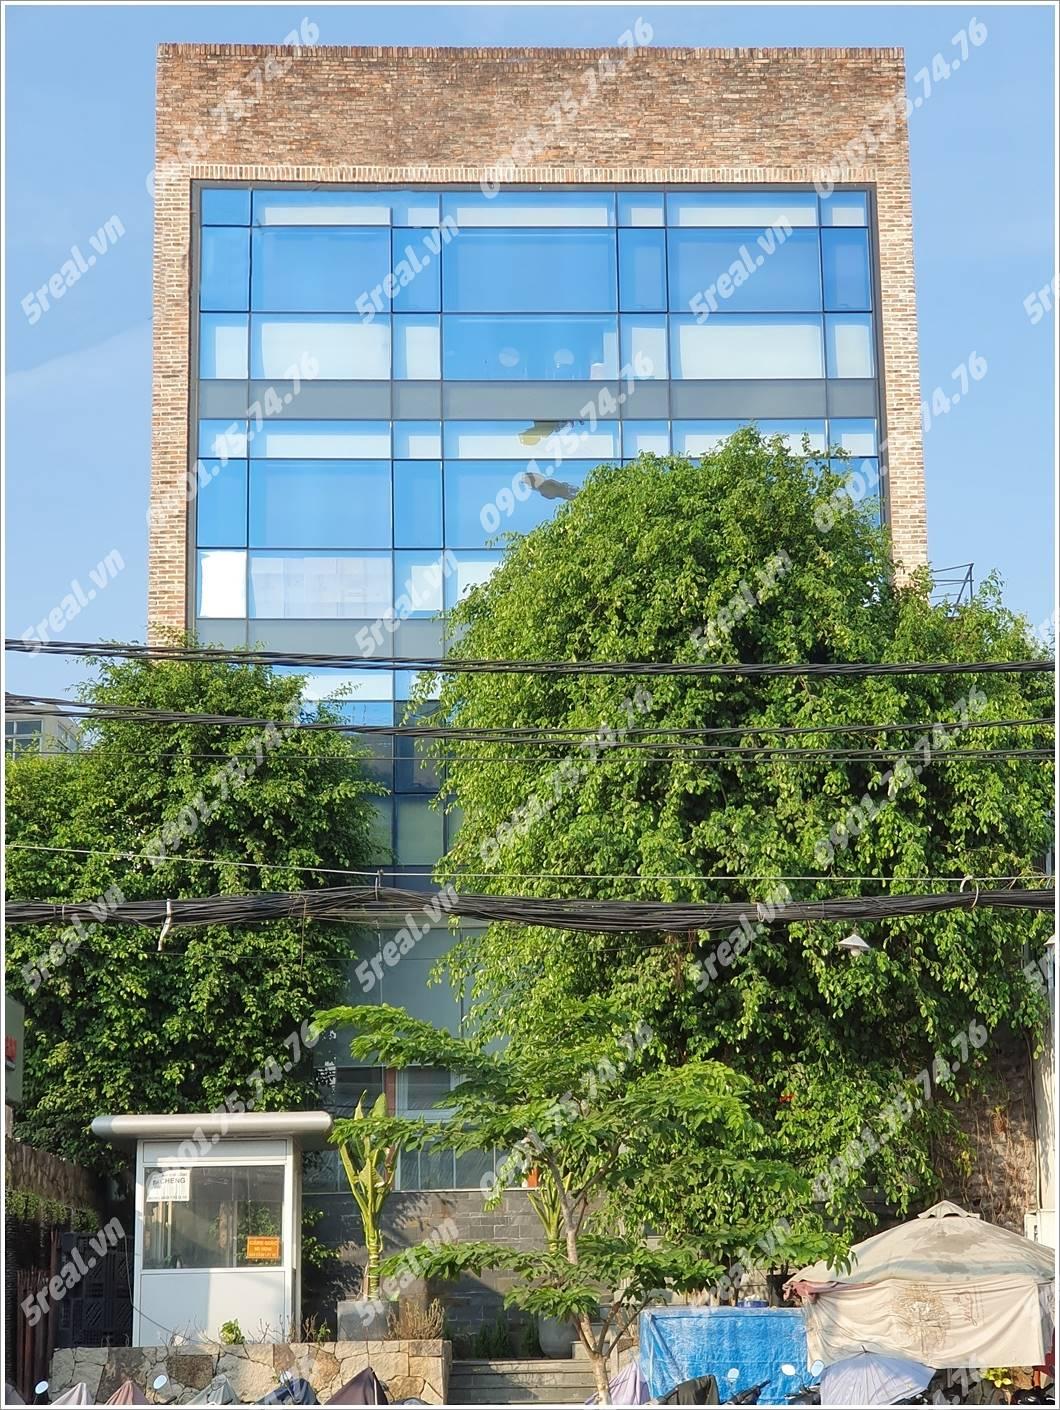 tacheng-building-dong-nai-quan-10-van-phong-cho-thue-tphcm-5real.vn-01